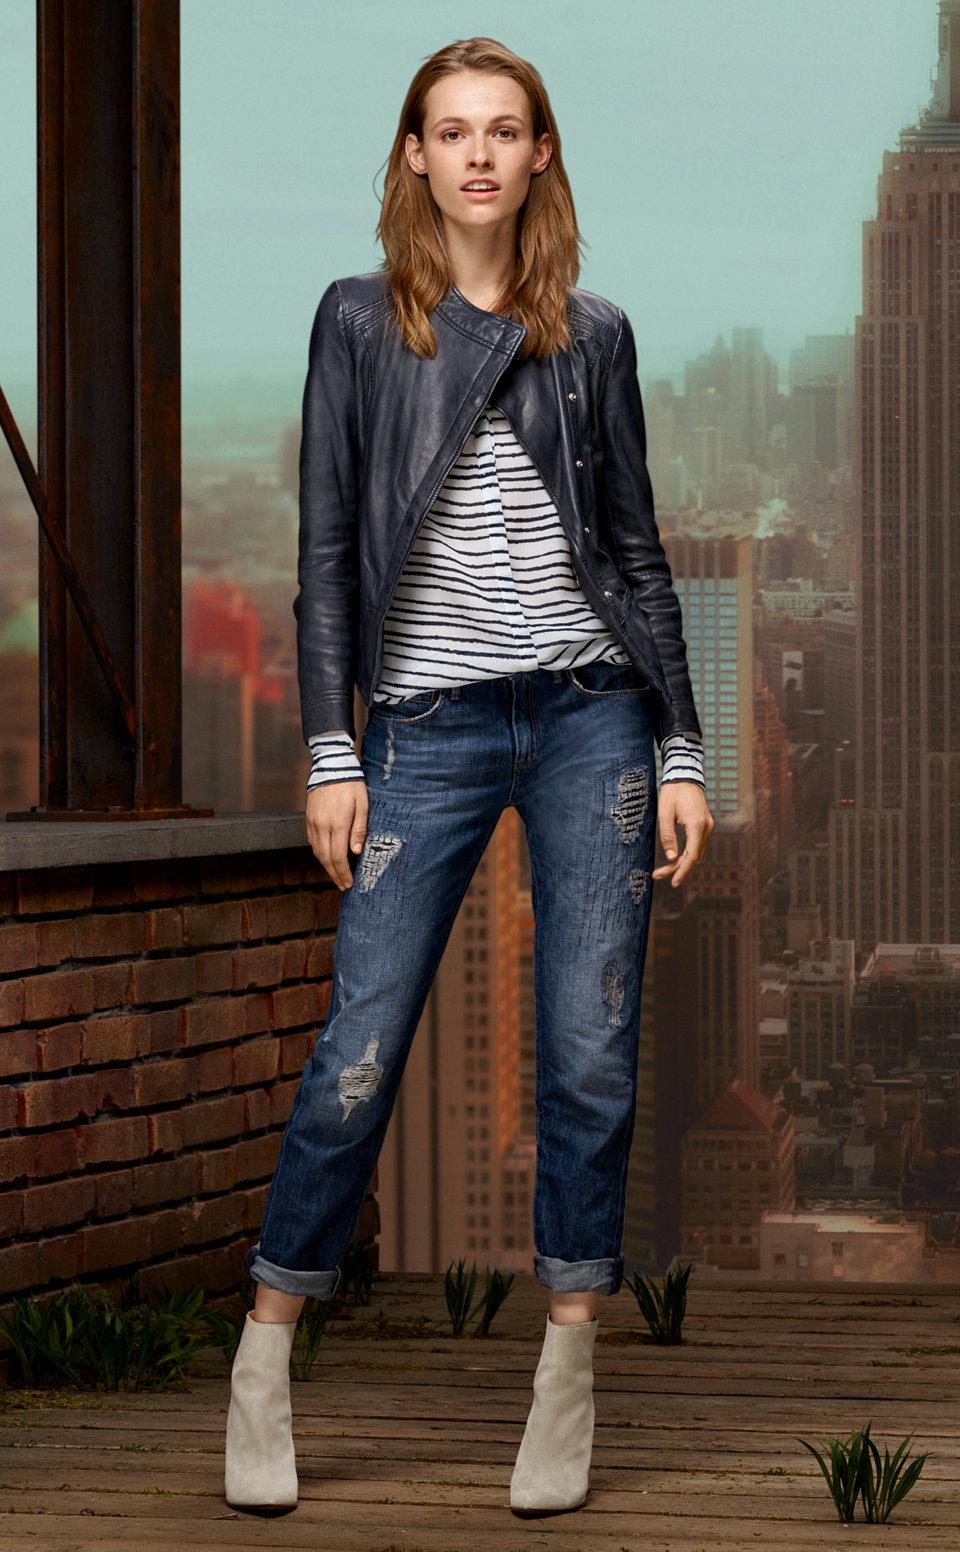 Blue leather jacket, striped blouse and blue jeans byBOSSOrange